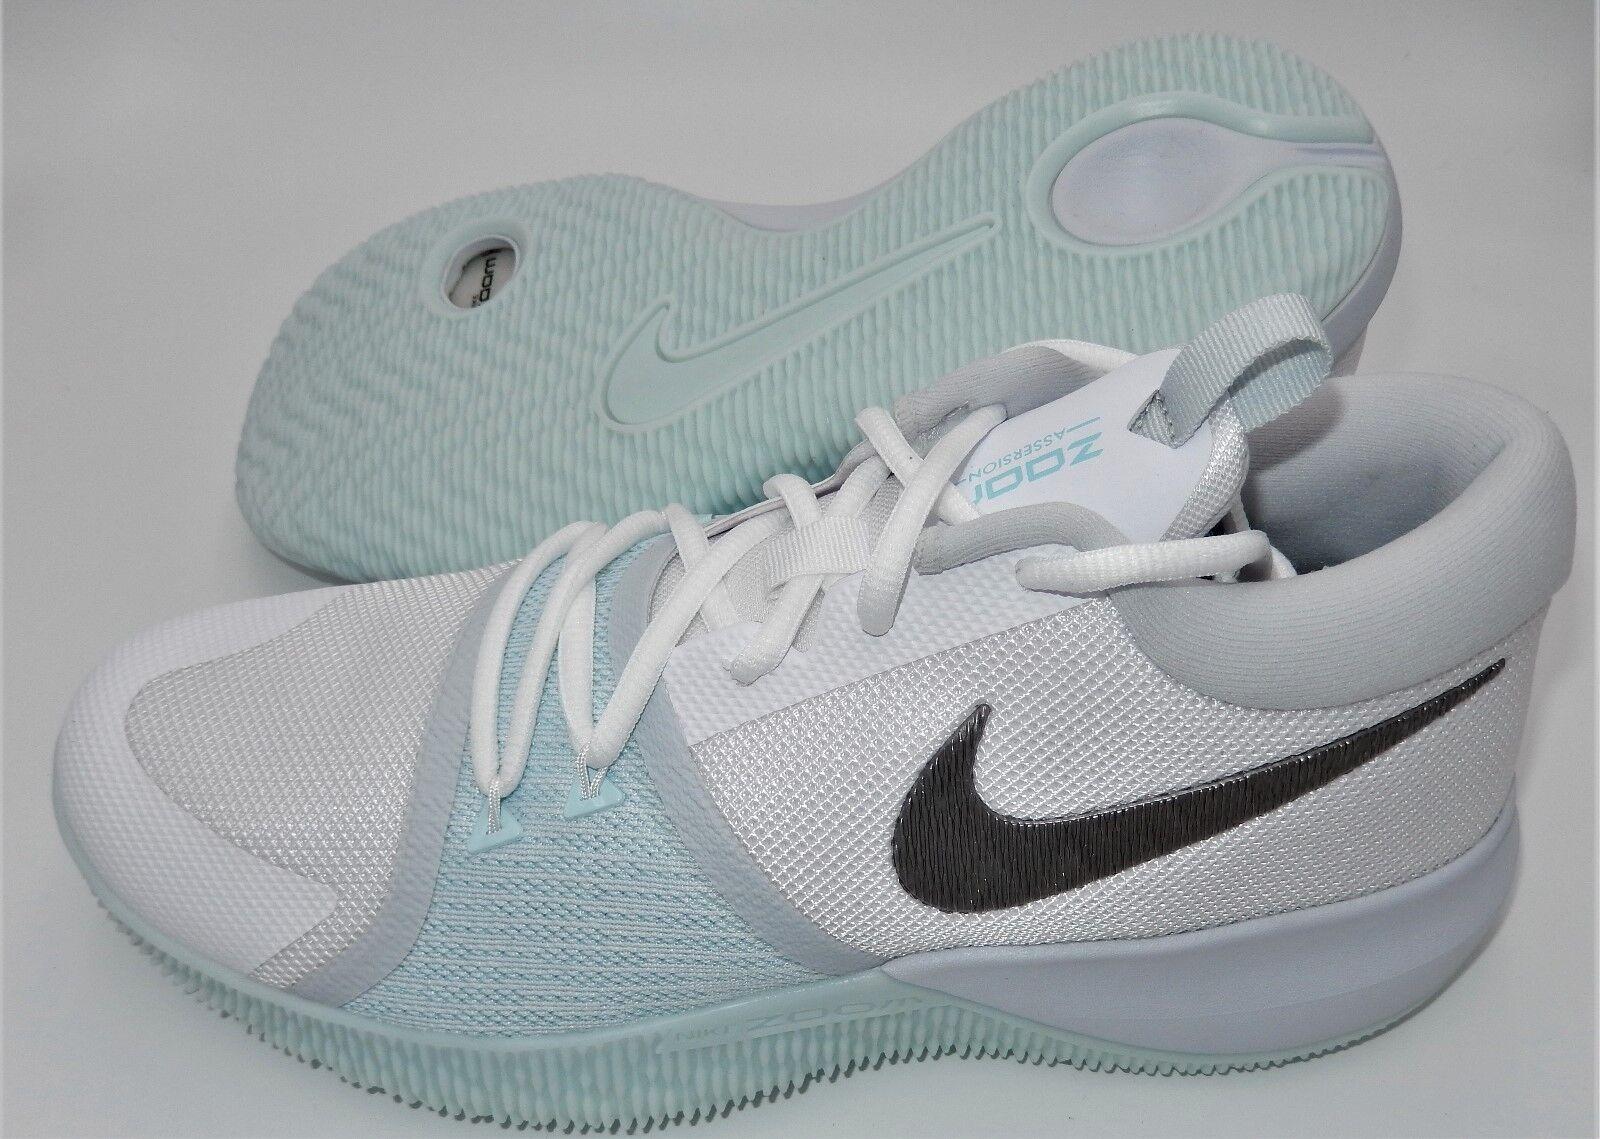 Nike hombre 9, zoom assersion tallas 8, 9, hombre 10, 10, 12 917505-104 blanco azul glaciar 952679